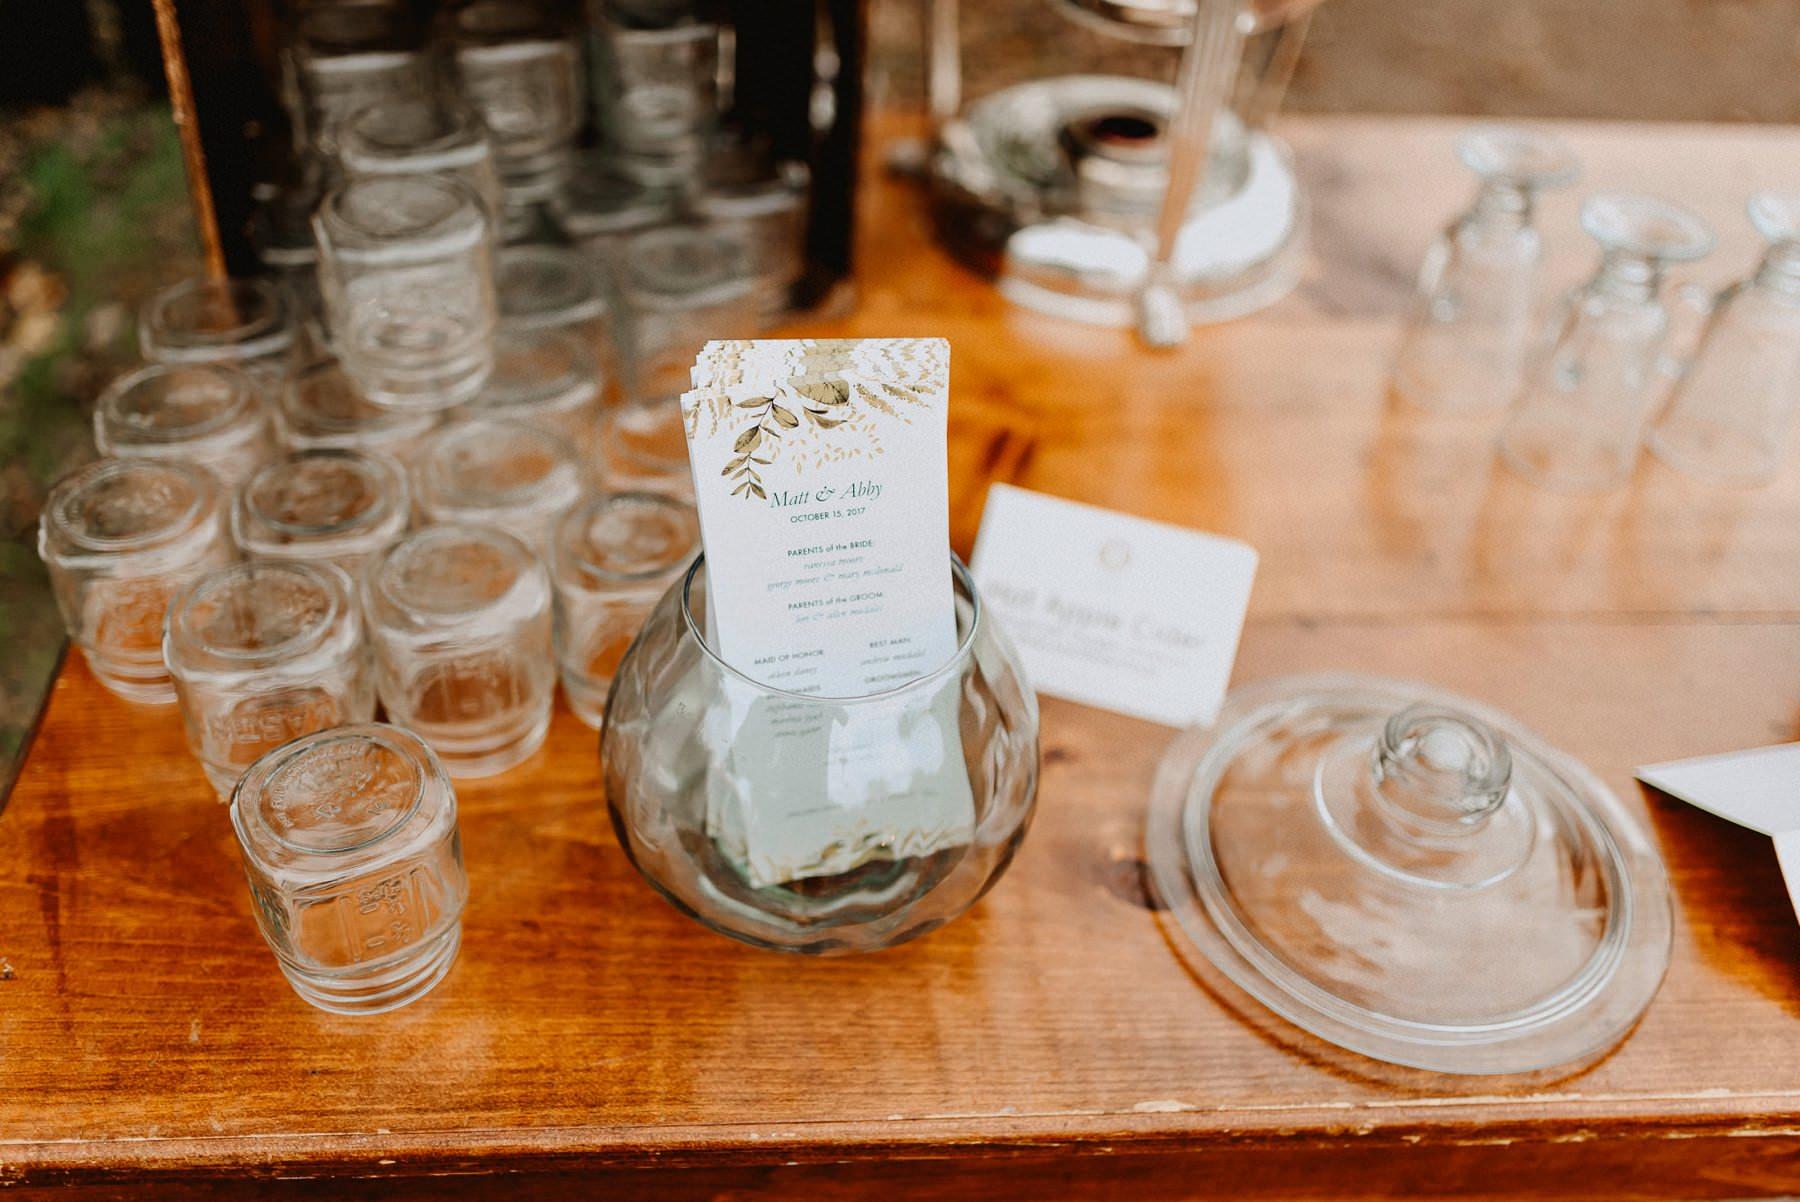 John_James_Audubon_Center_wedding-37.jpg